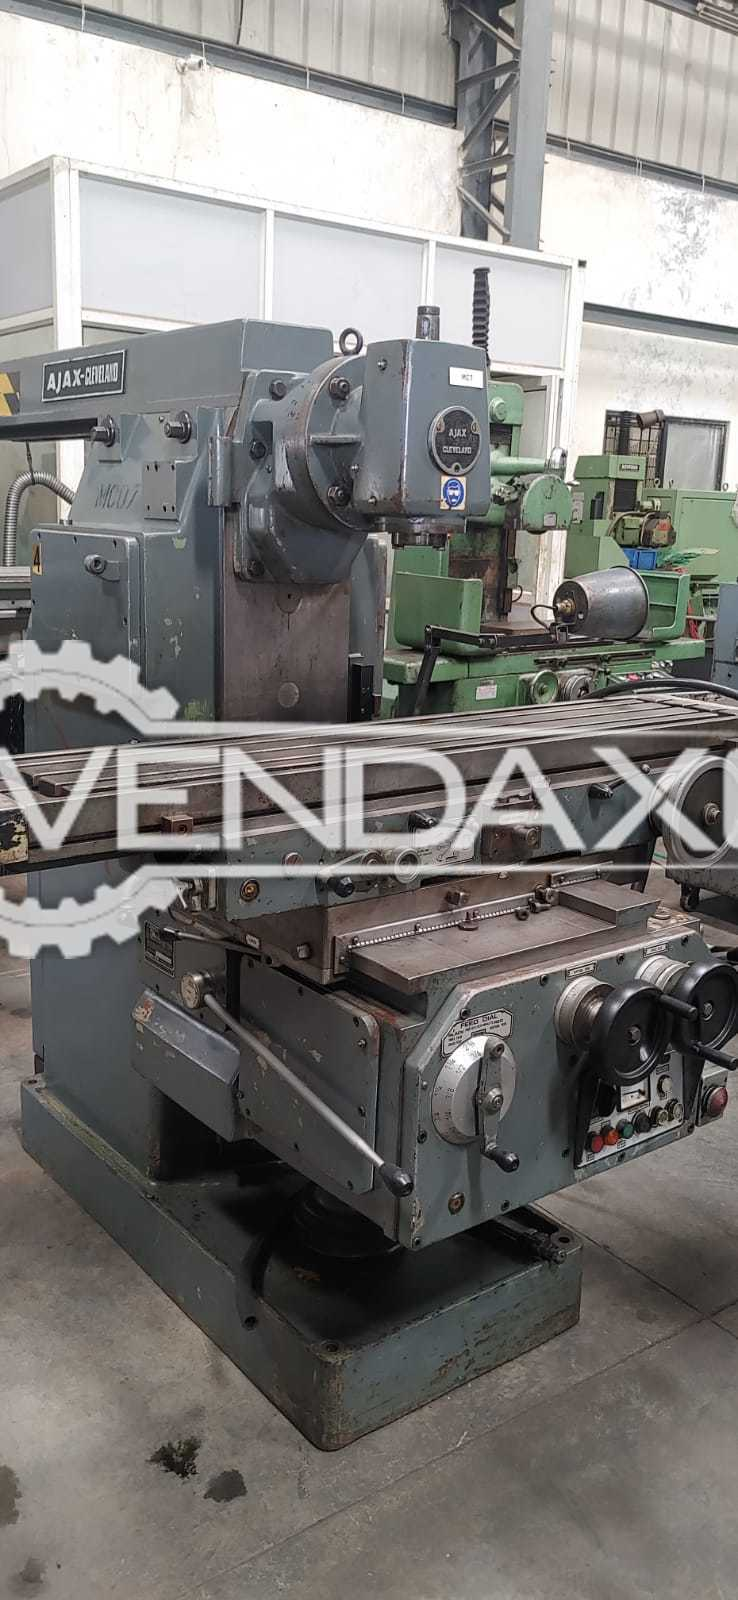 Ajax Heavy Duty Milling Machine - Universal, Gray Color